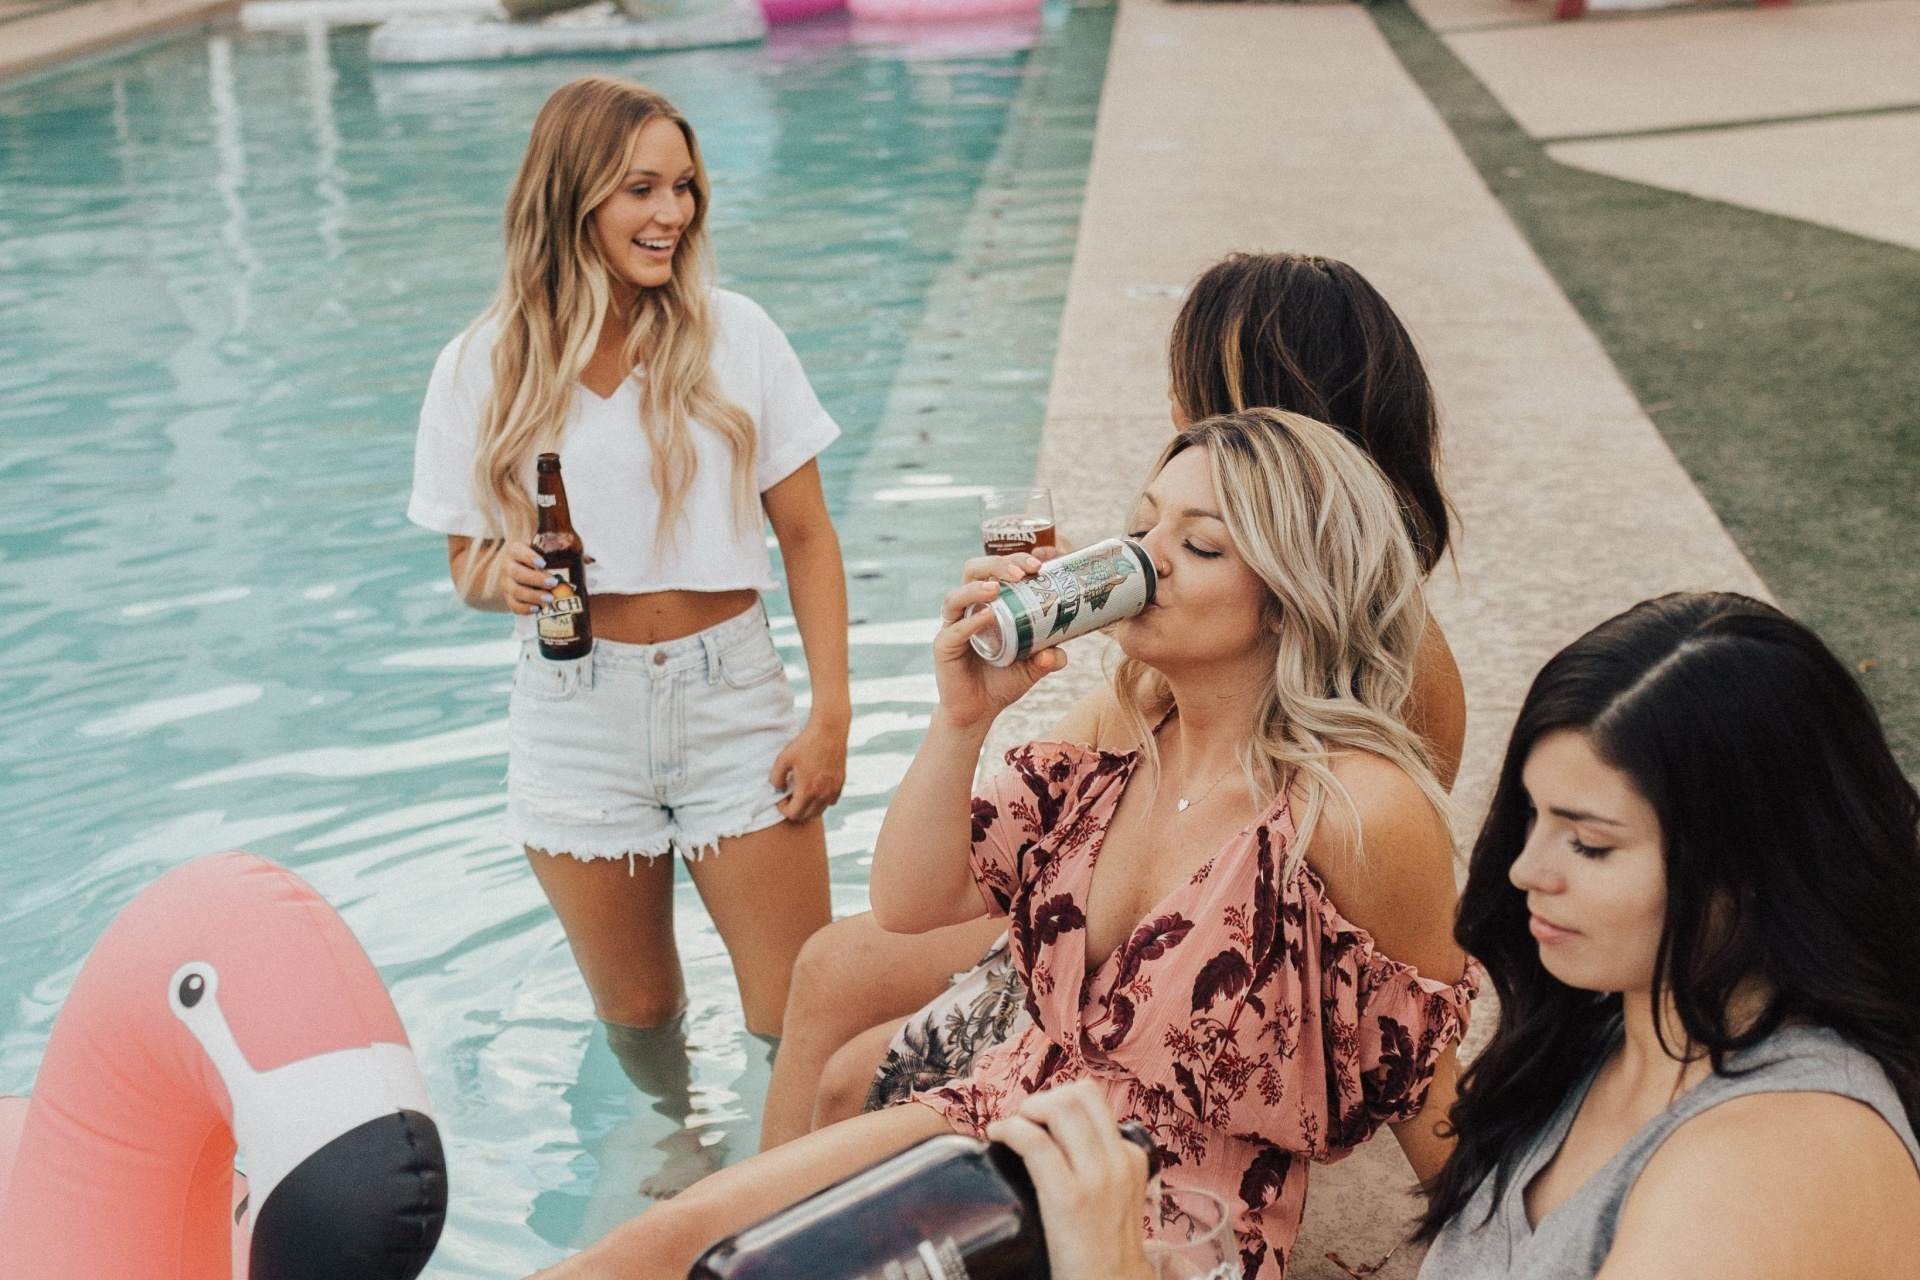 X Kickass Bachelorette Party Ideas (So You Can Skip The Strip Club)